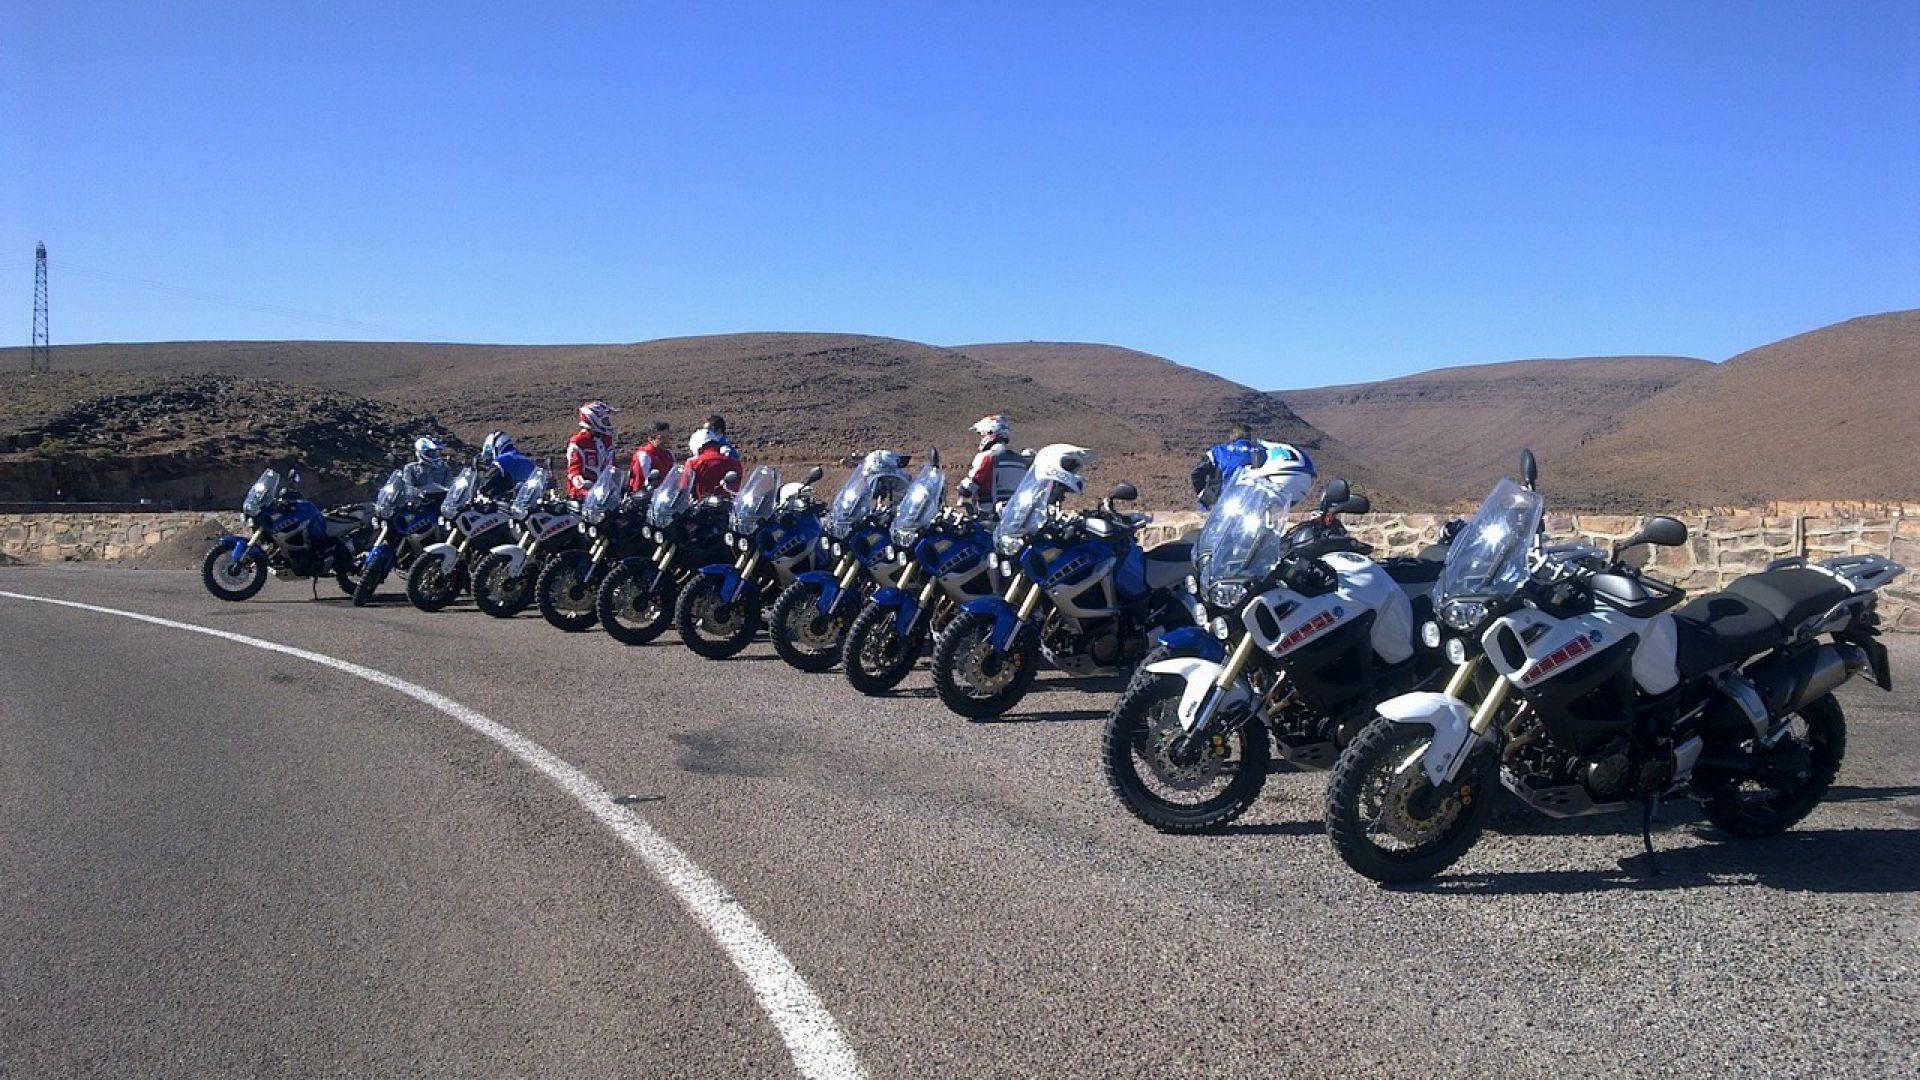 Immagine 168: In Marocco con la Yamaha Super Ténéré